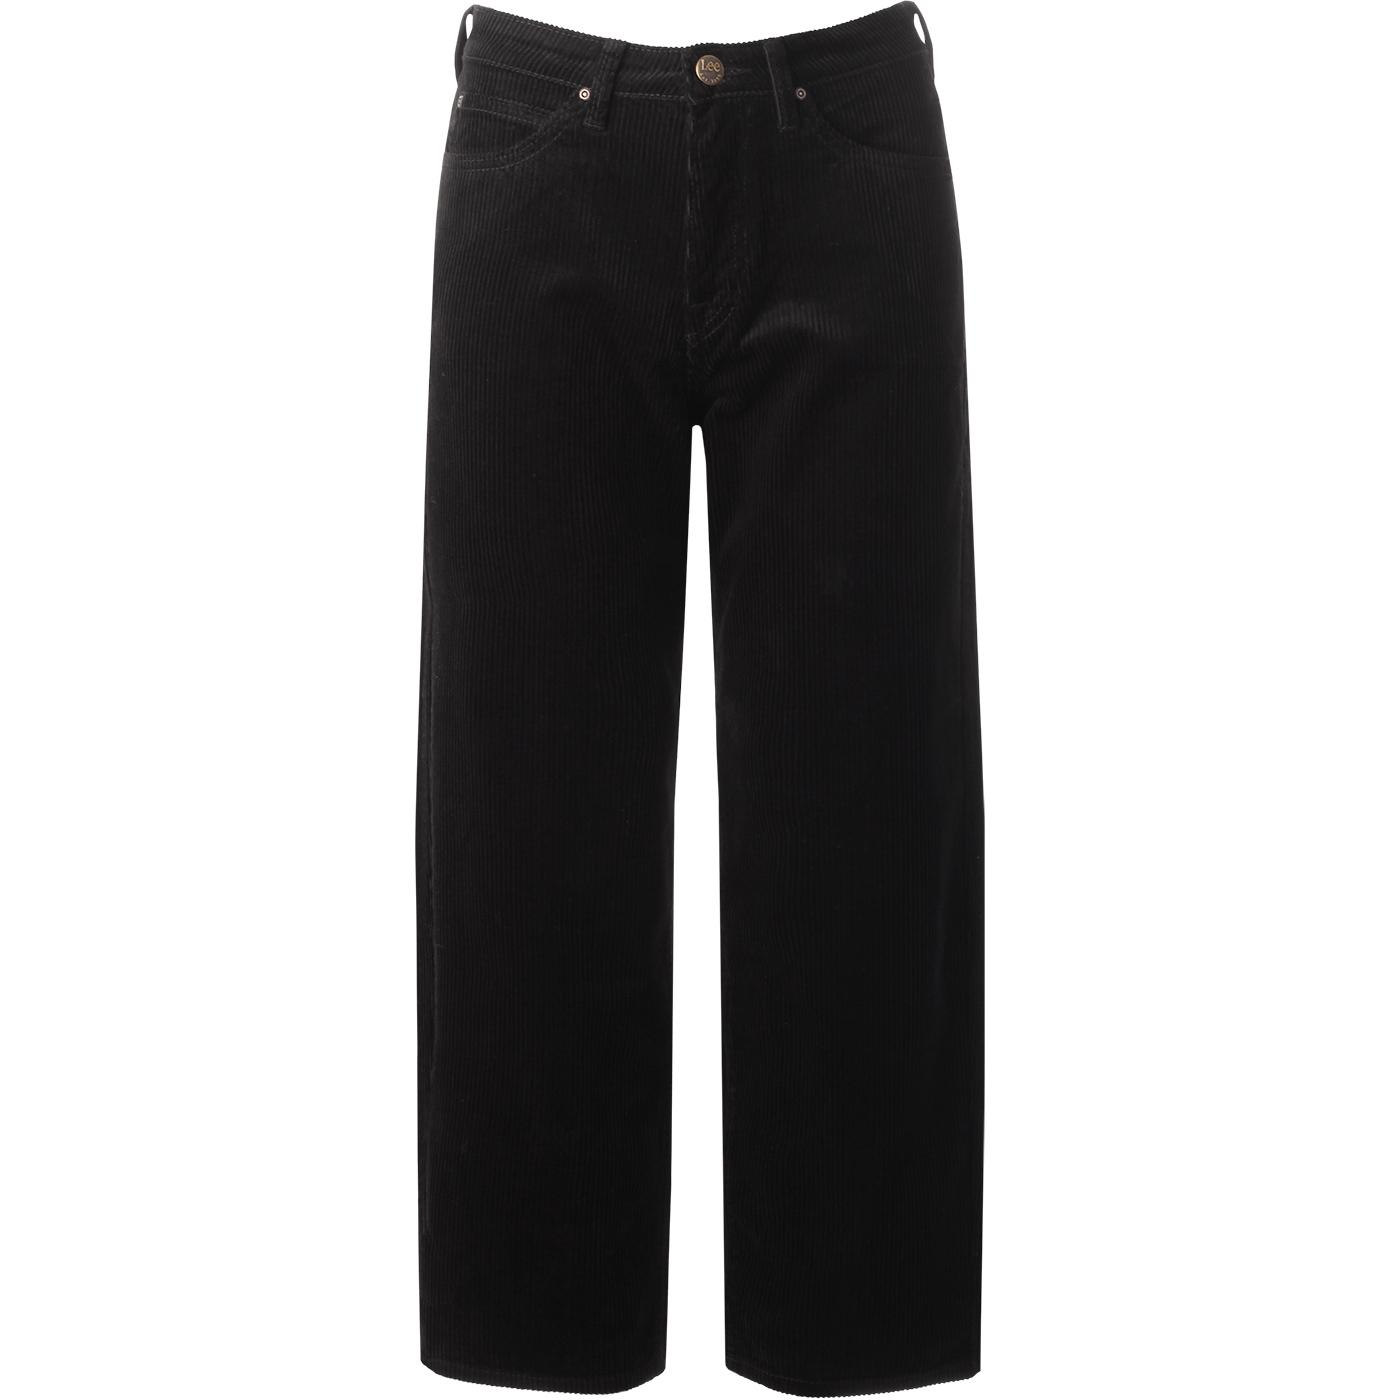 LEE Womens 5 Pocket Cord Wide Leg Trousers (Black)